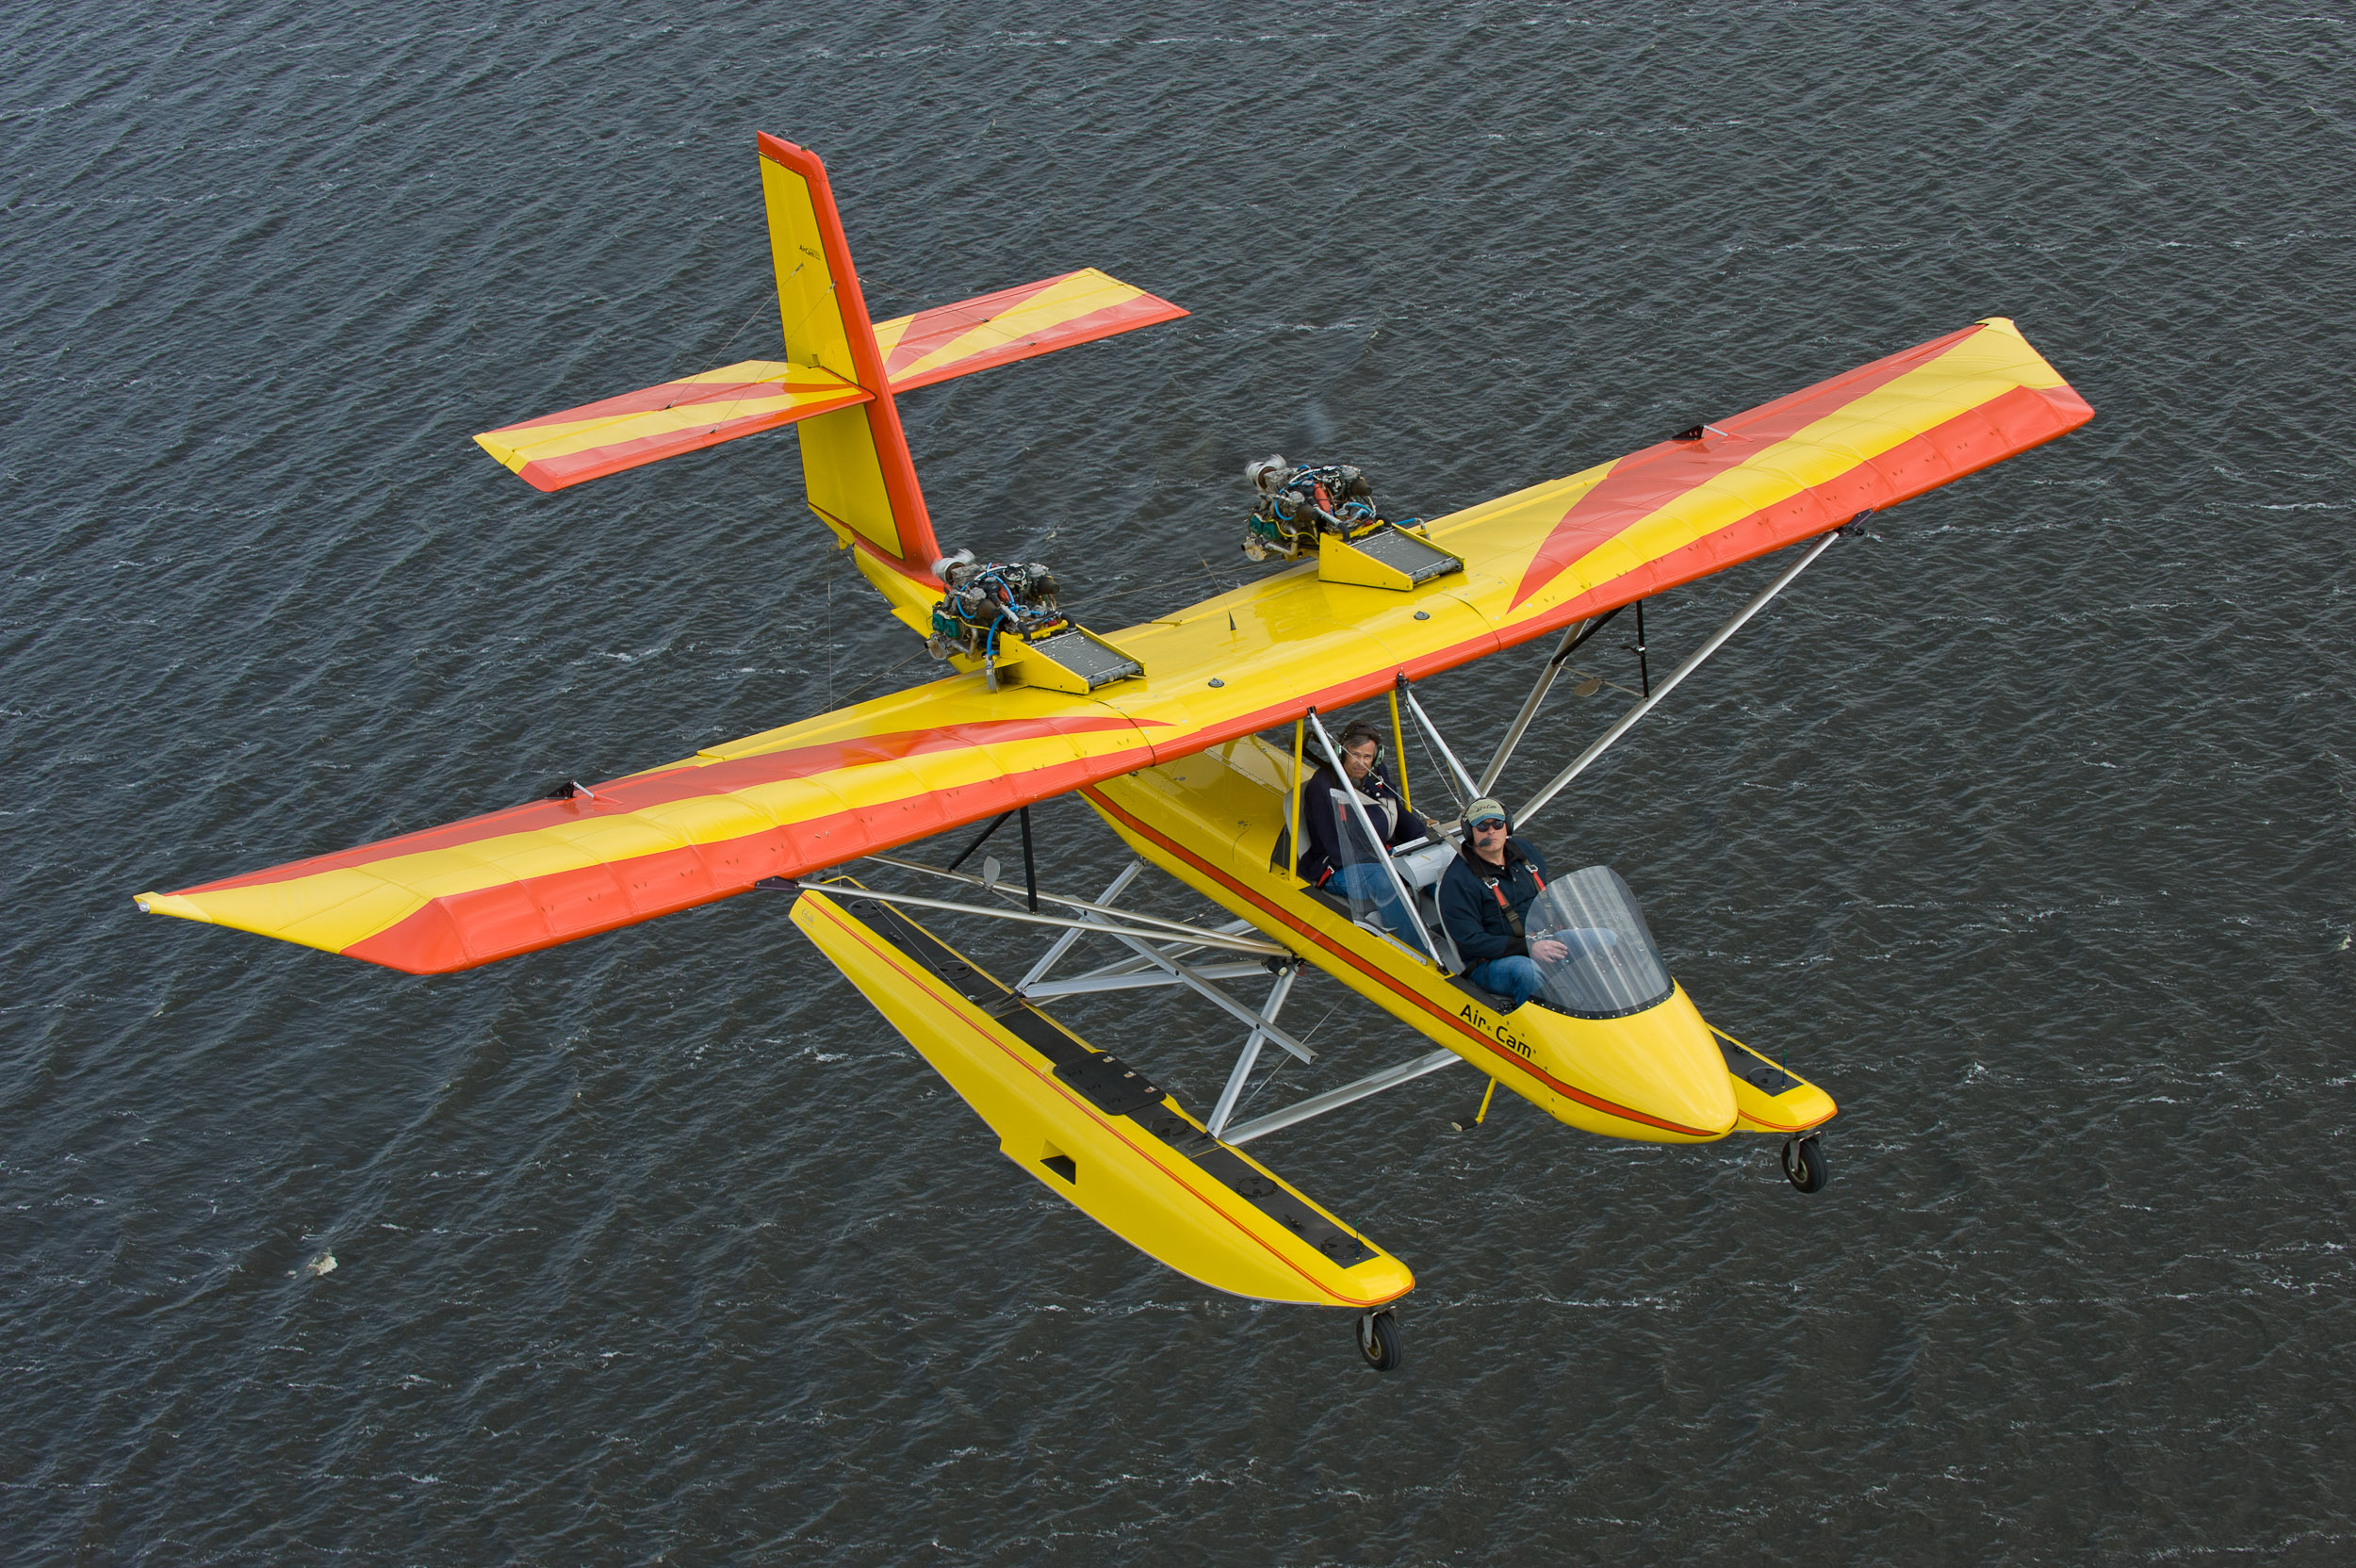 AirCam Gen-3 Boasts More Power - Plane & Pilot Magazine